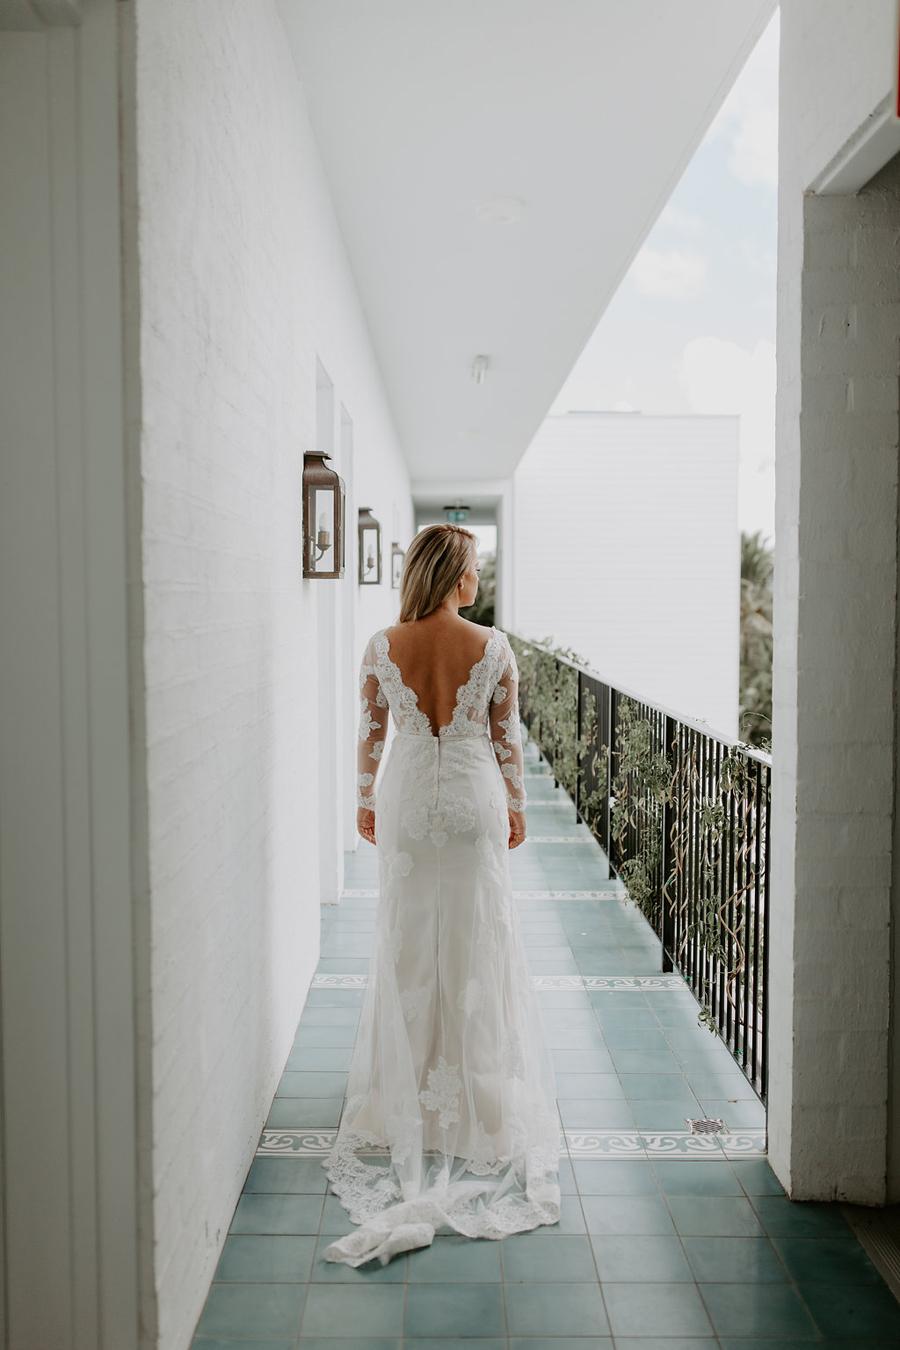 osteria-casuarina-wedding-venue-tweed-coast-weddings-coastal-garden-reception-real-wedding009.jpg